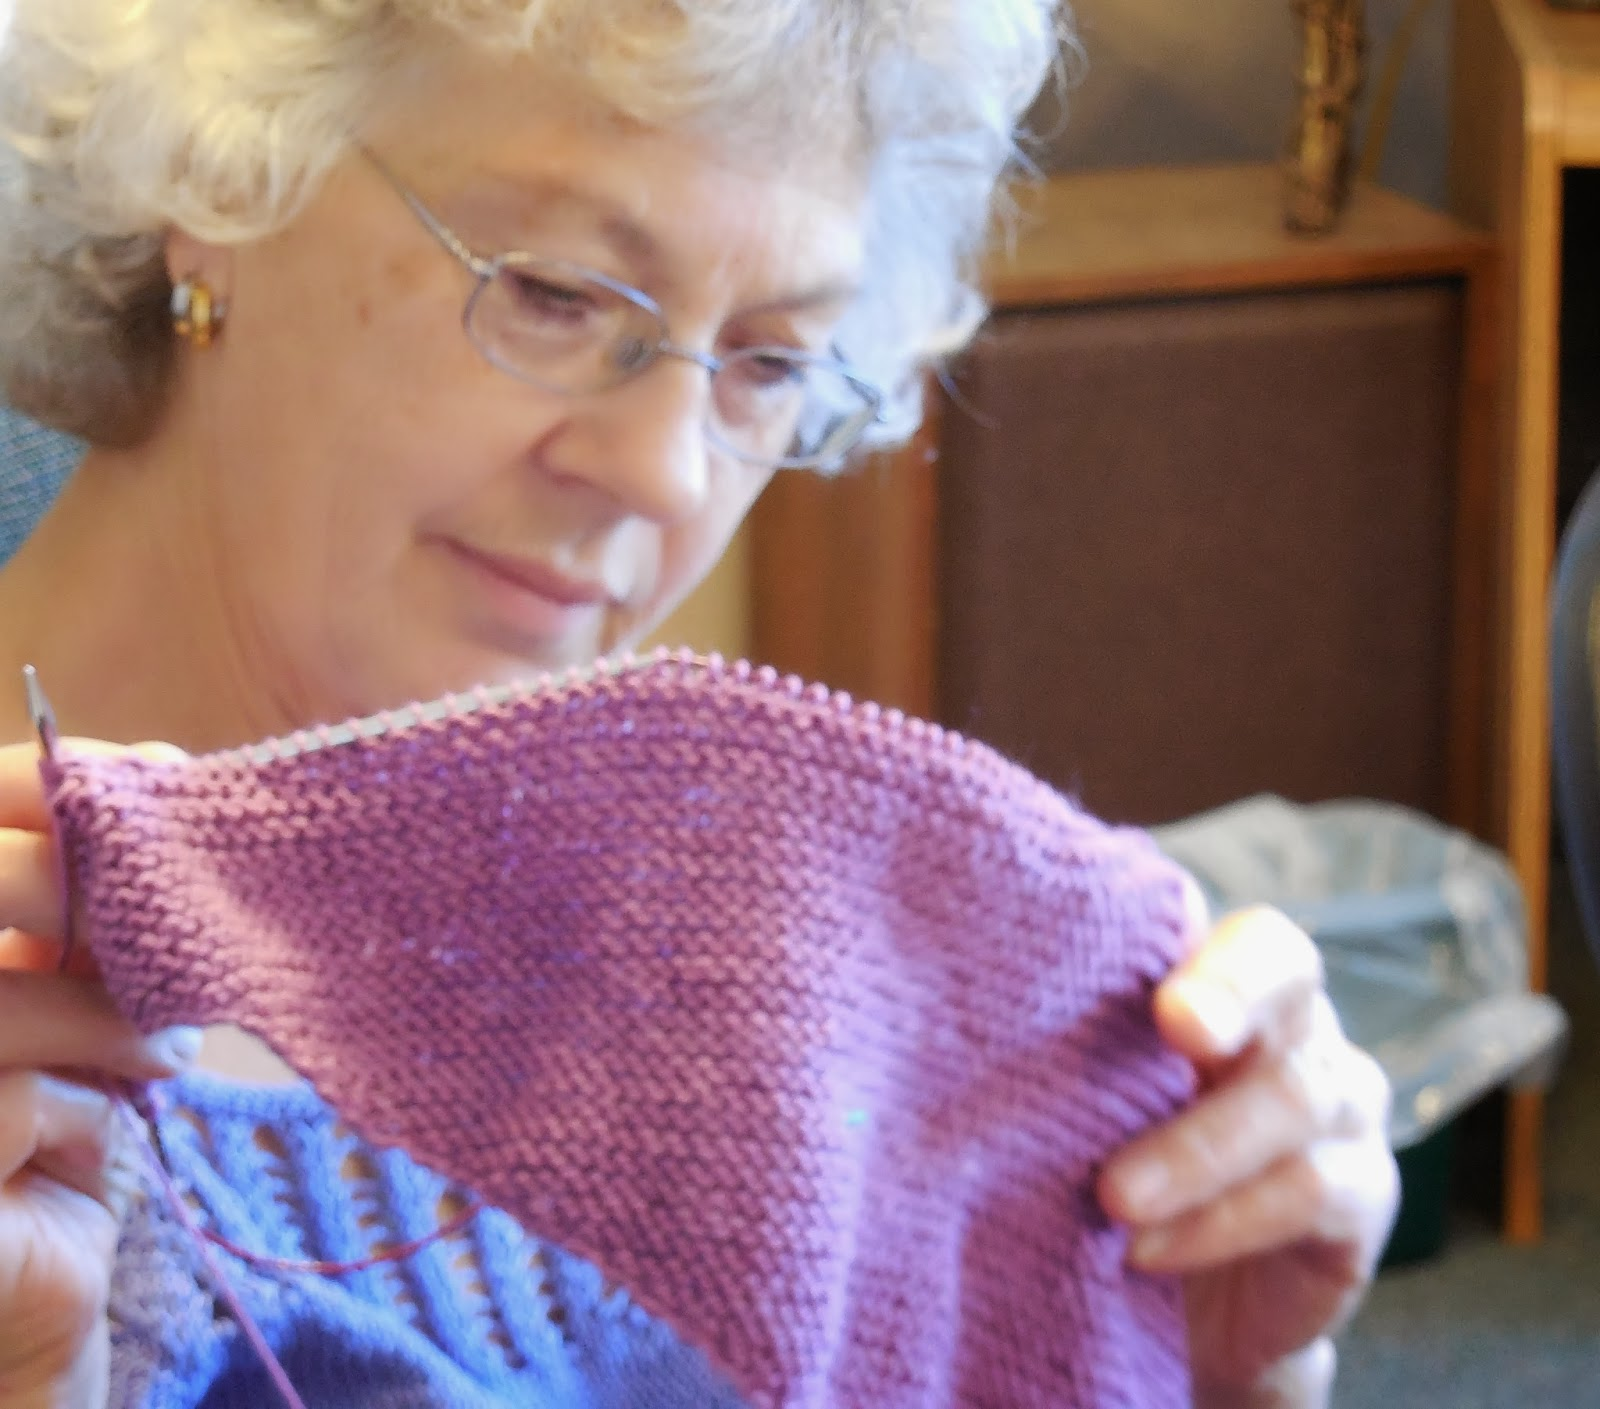 Knitting Groups Near Me : Brenda knits thursdays are for knit group